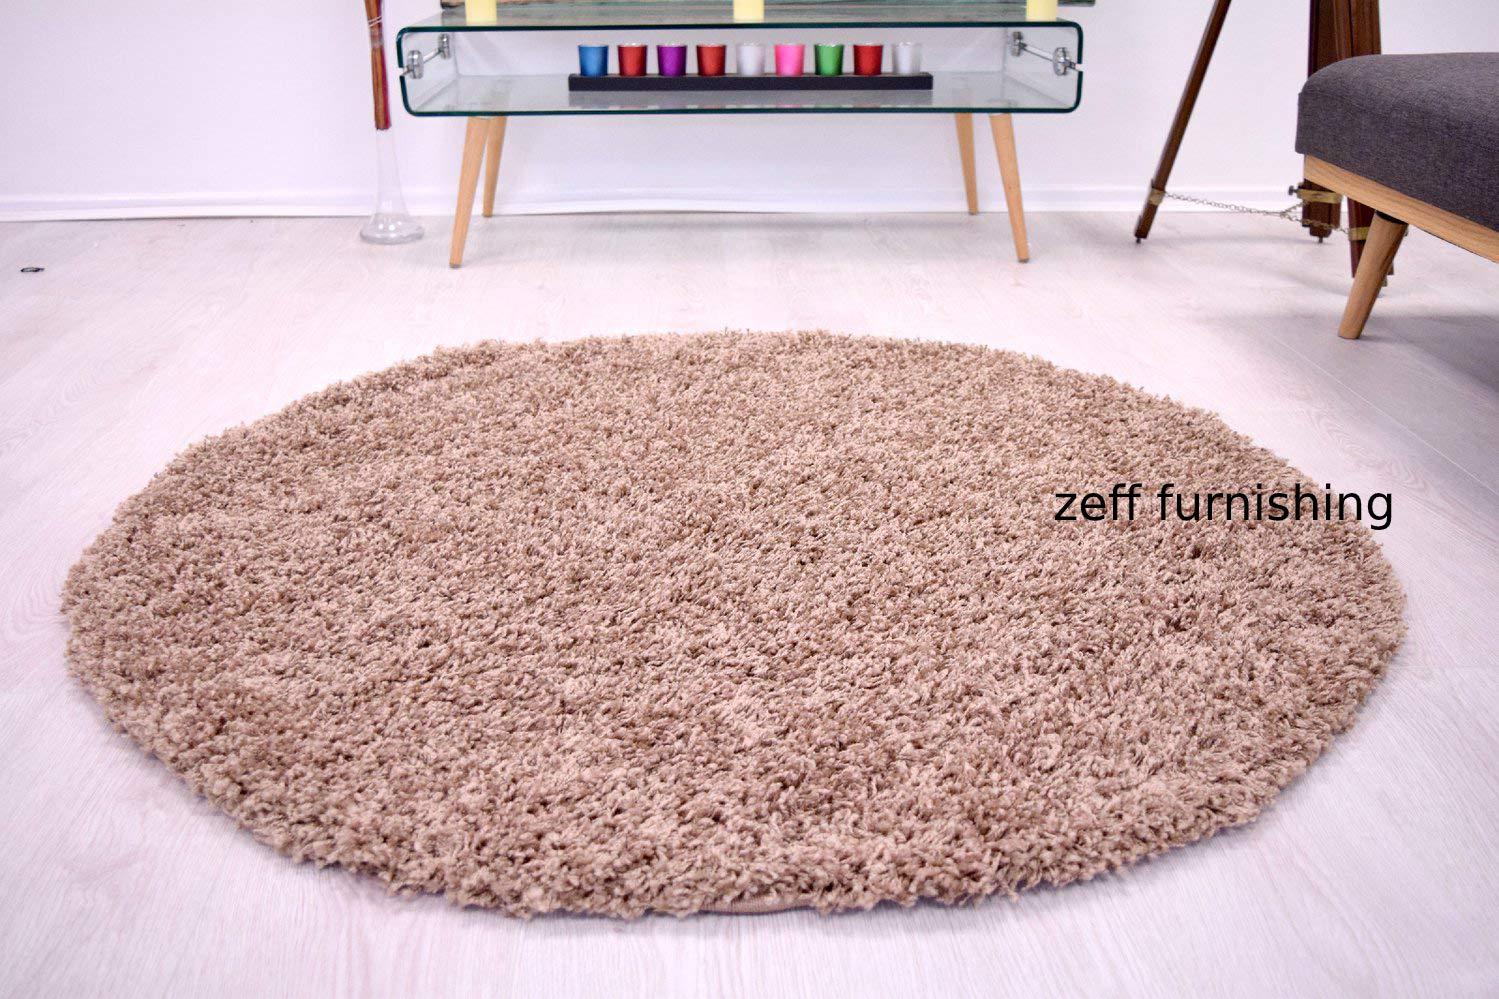 Zeff Furnishing Polyester Anti Slip Shaggy Fluffy Fur Rugs and Carpet for Living Room, Bedroom (Ivory, 4x4 feet Round) (B082LTLJFZ) Amazon Price History, Amazon Price Tracker